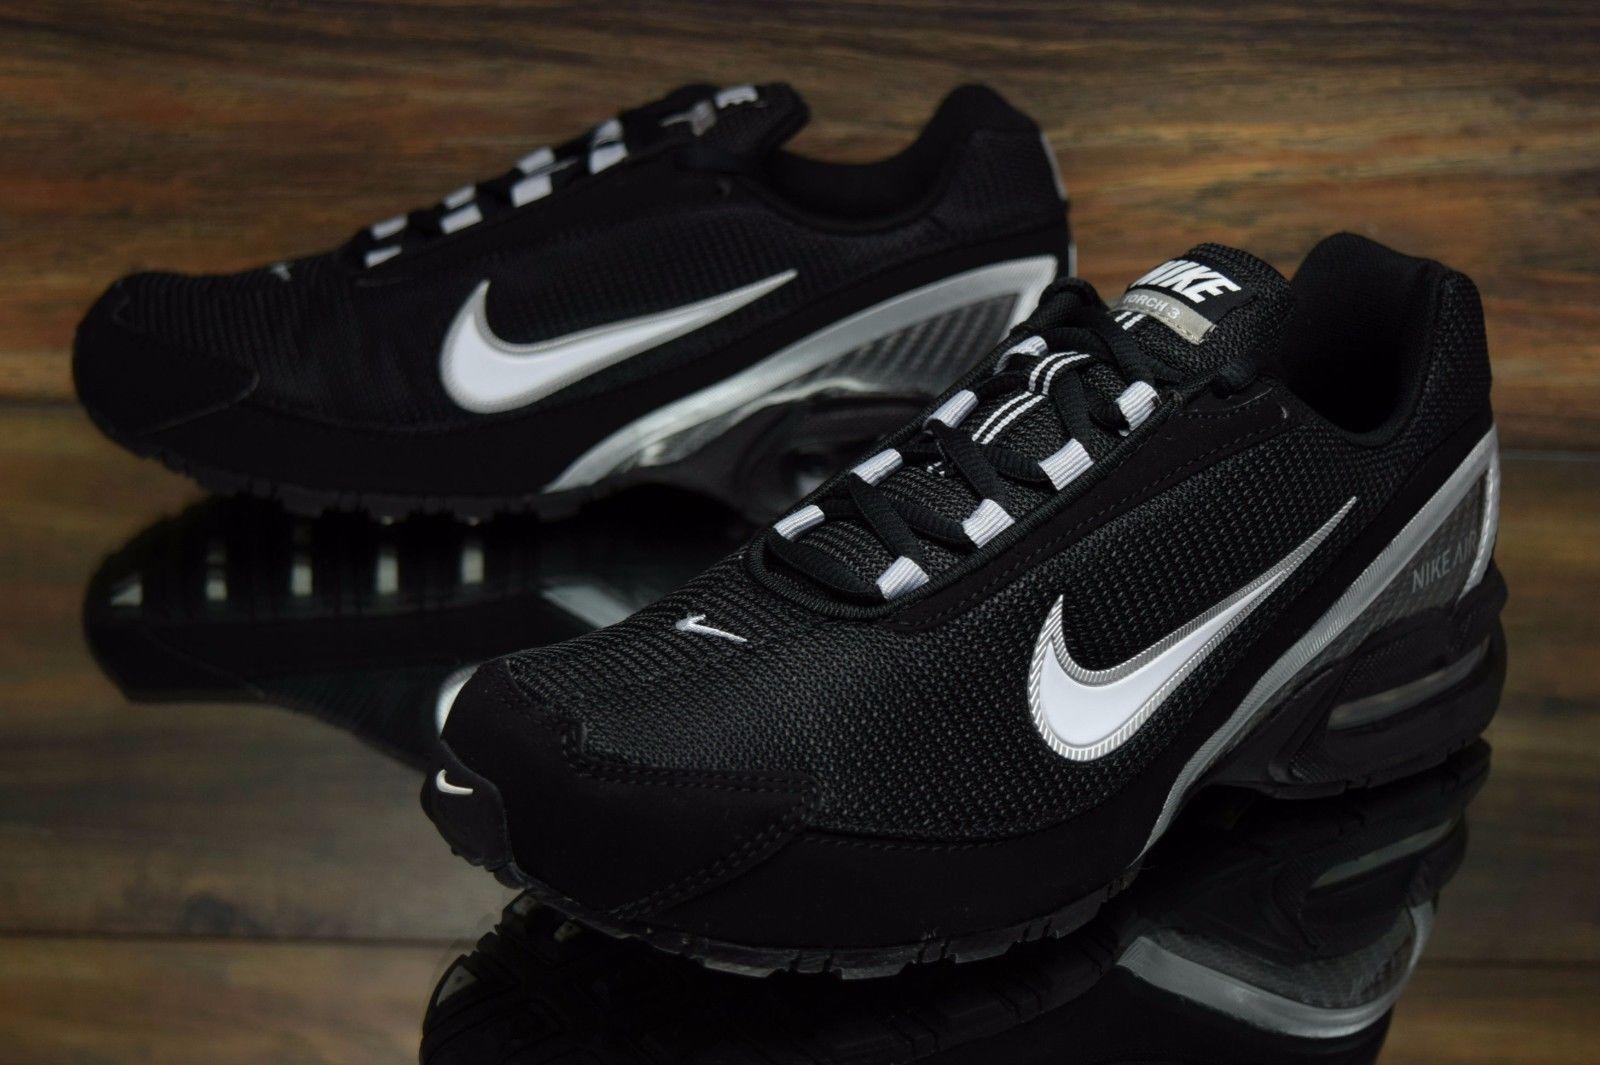 b143223fa1 Nike Air Max Torch 3 Black White 319116-011 Running Shoes Men